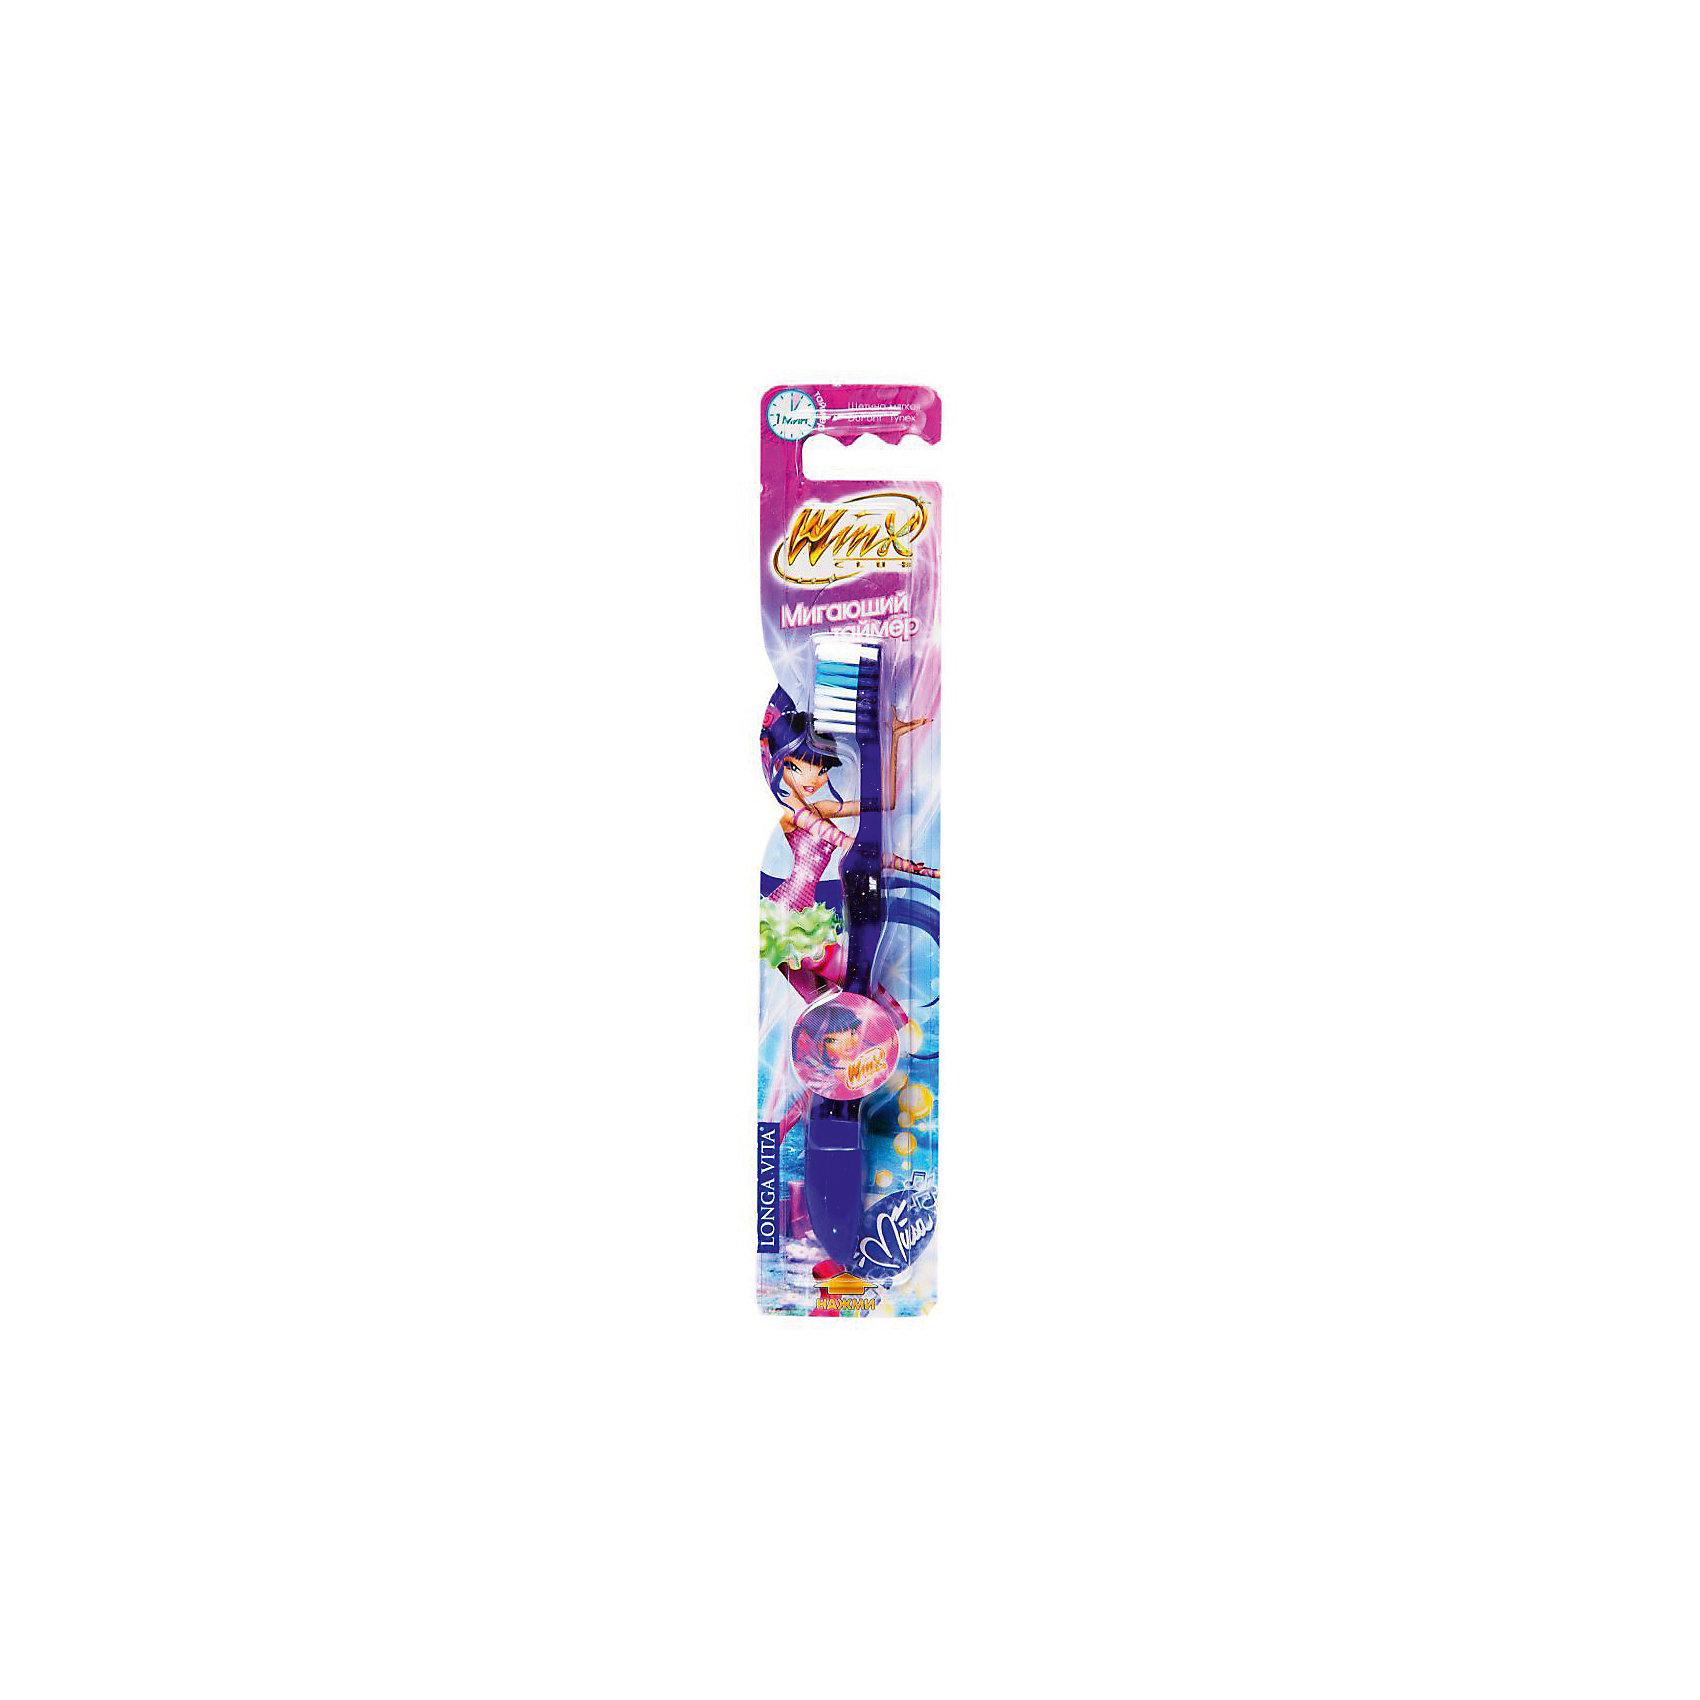 LONGA VITA Зубная щетка с мигающим таймером, от 3-х лет, Winx, LONGA VITA, фиолетовый longa vita longa vita зубная щетка winx с мигающим таймером от 3 х лет голубая